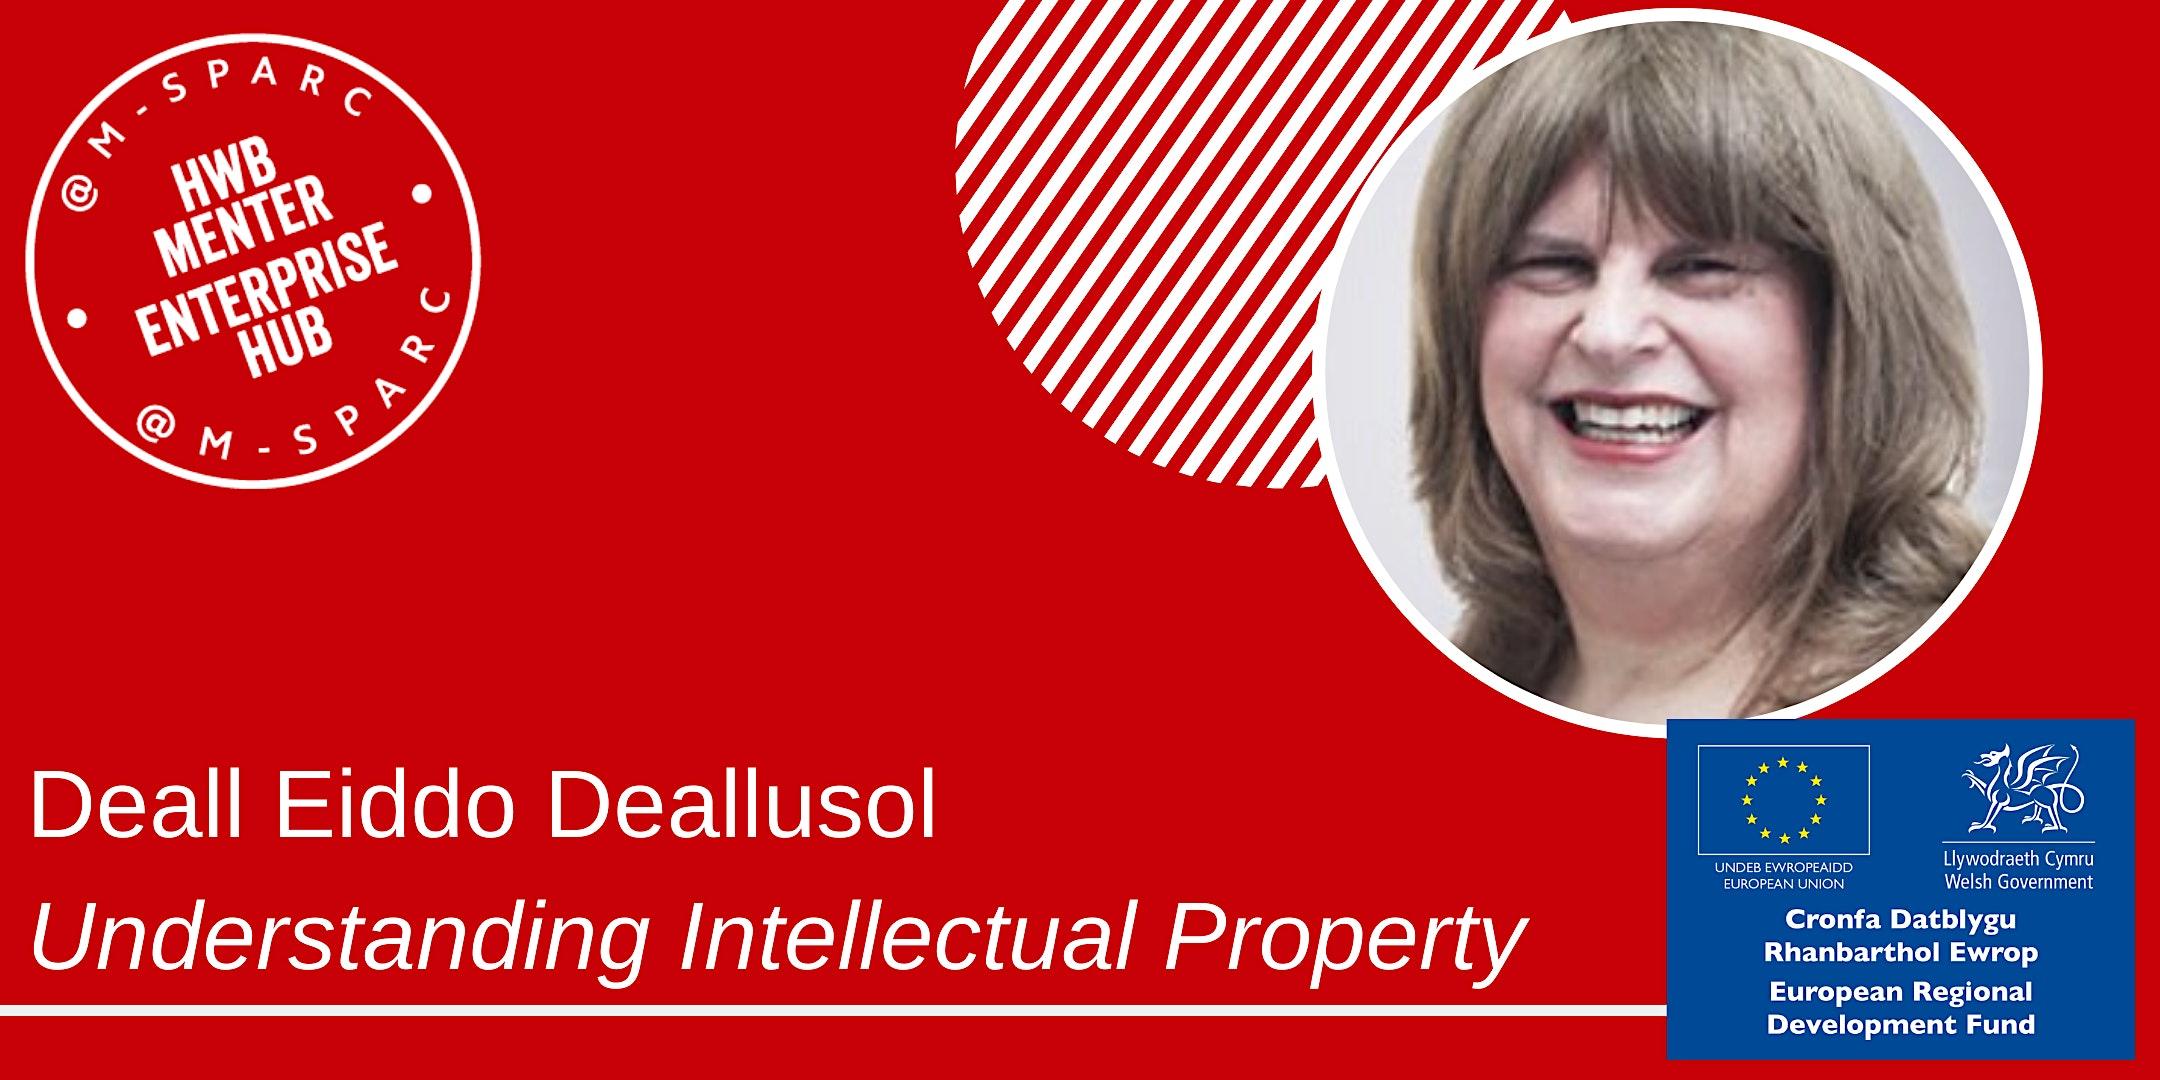 Covid-19:  Deall Eiddo Deallusol / Understanding Intellectual Property